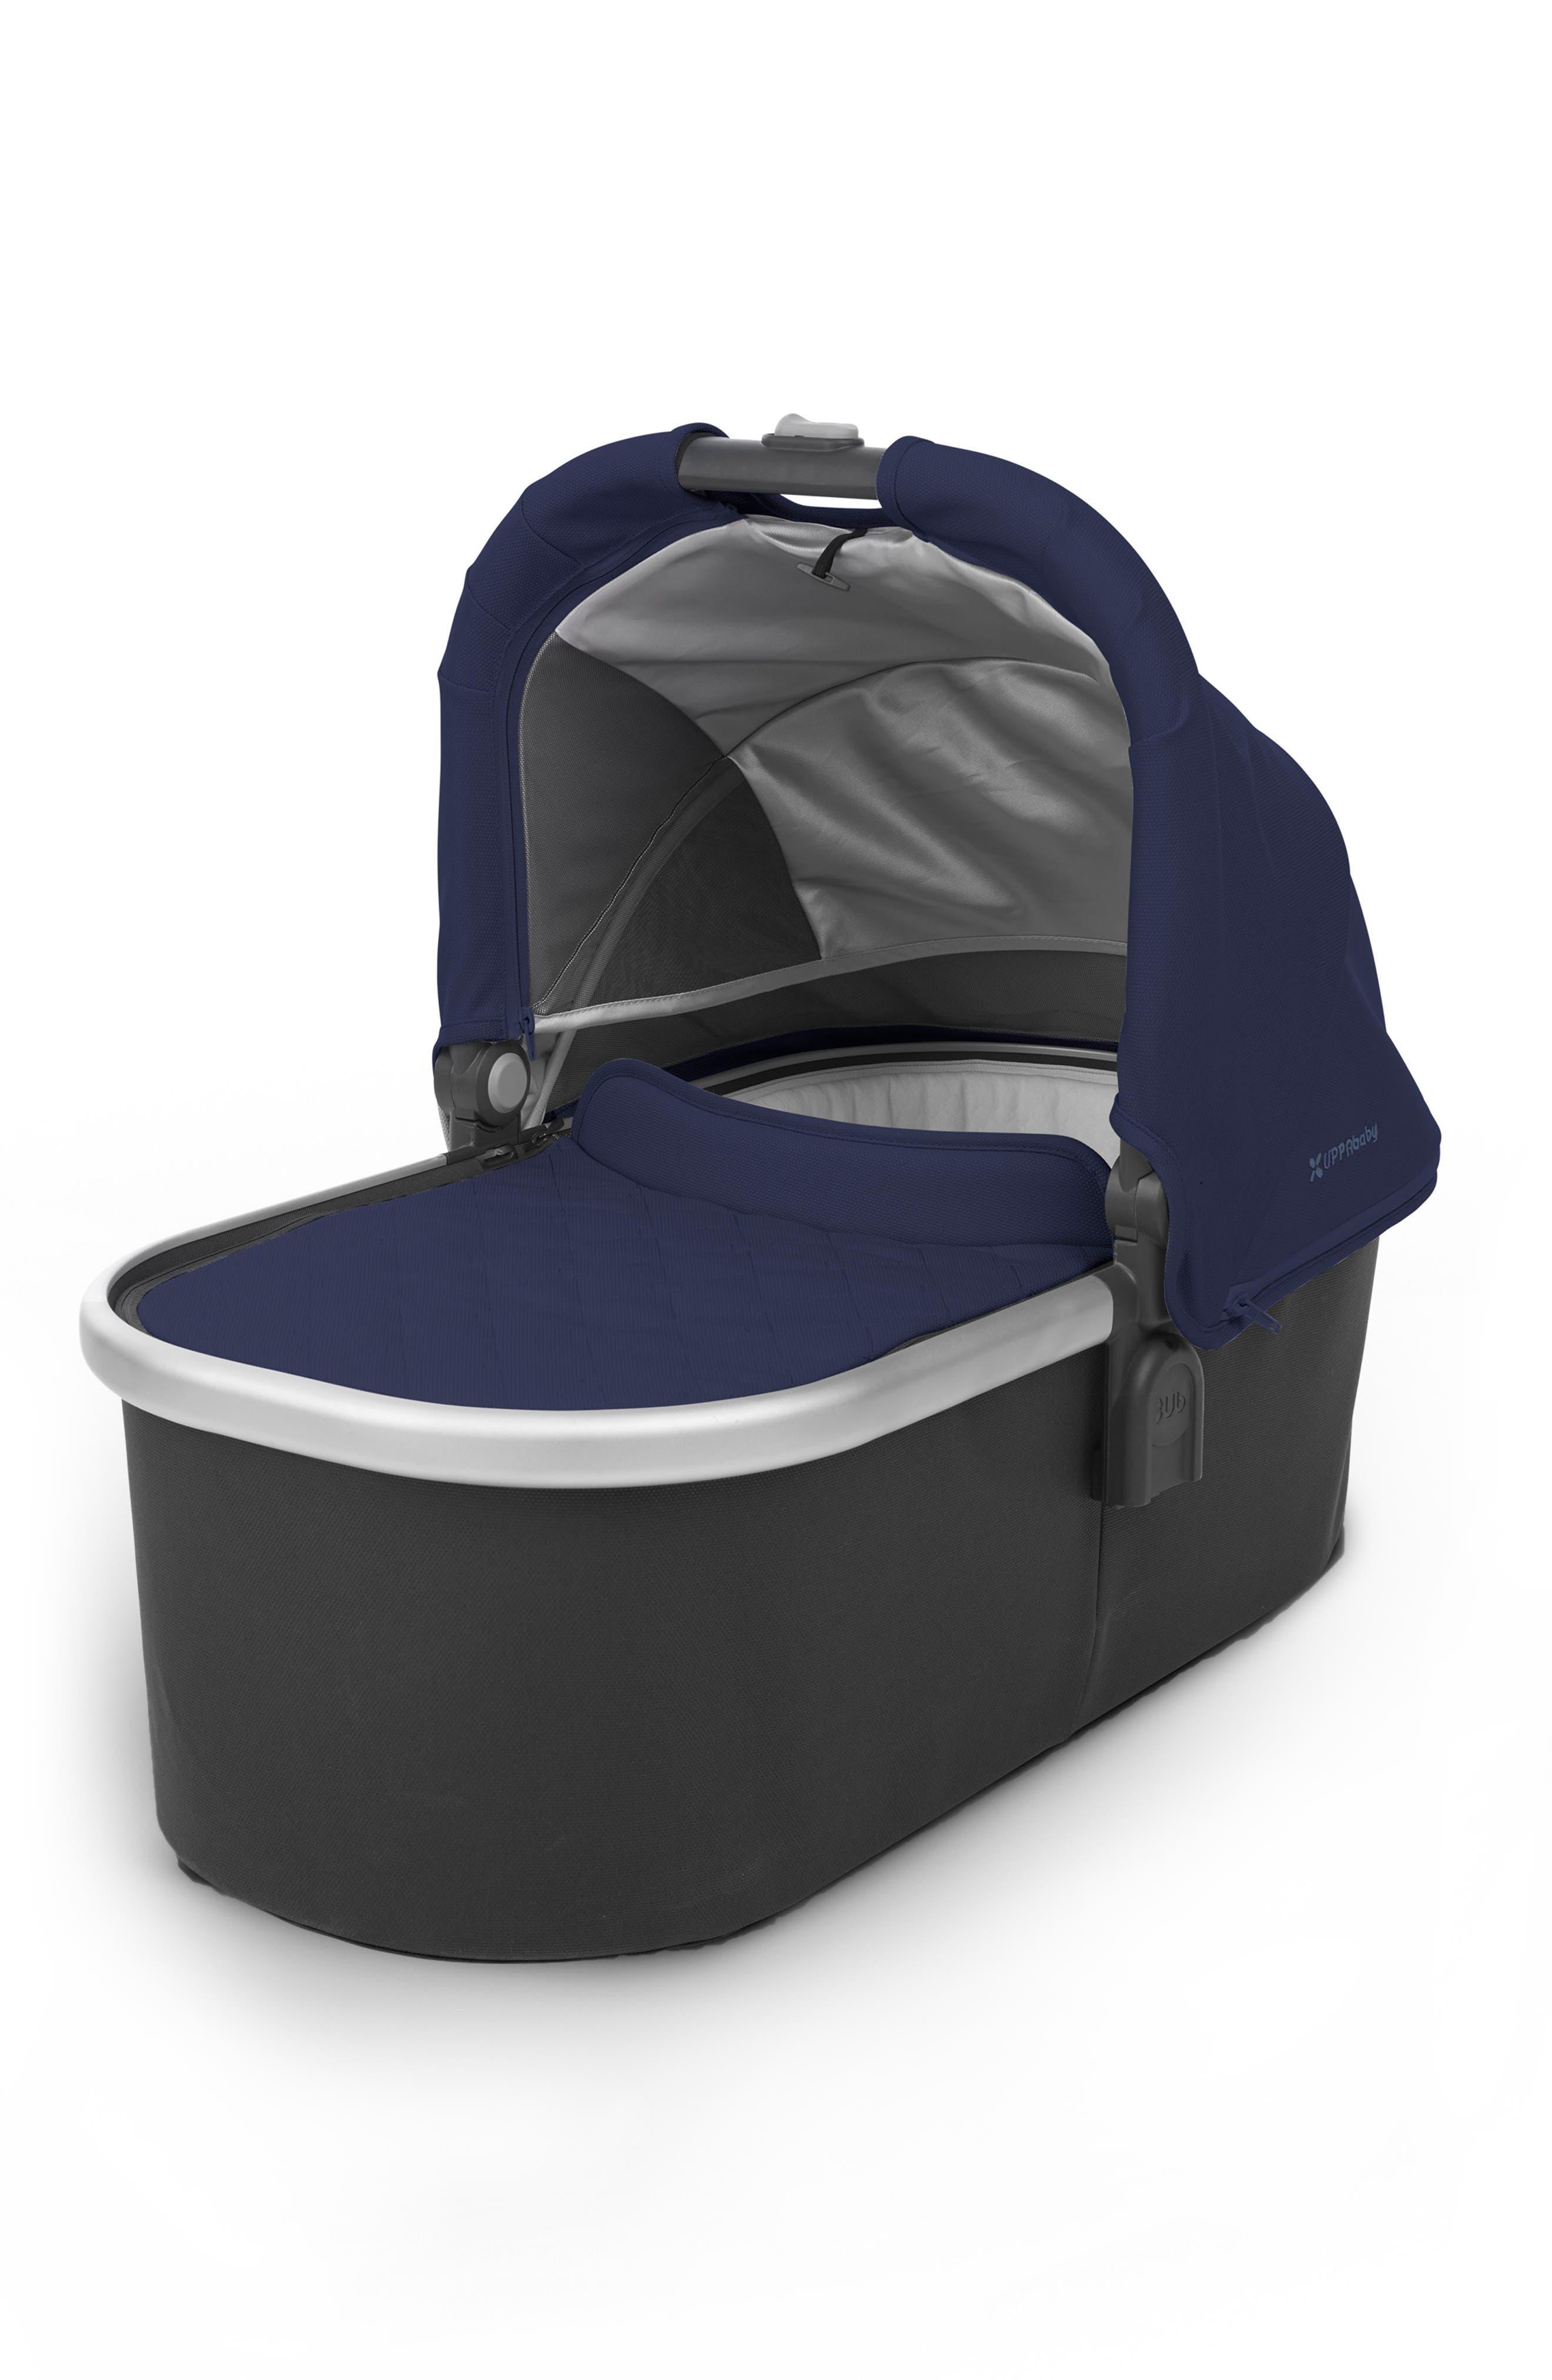 UPPAbaby 2018 Bassinet for CRUZ or VISTA Strollers